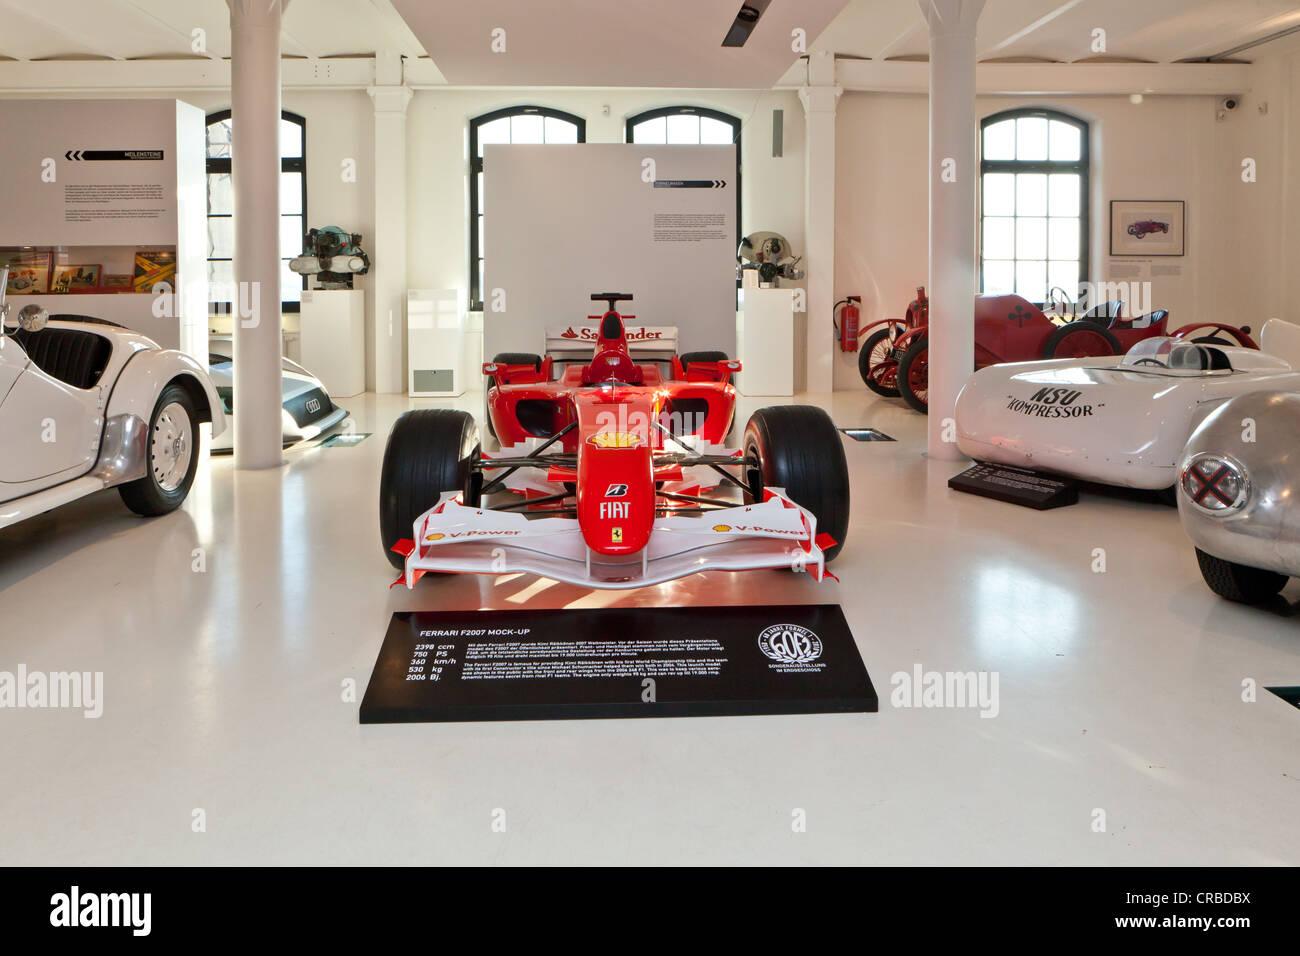 Ferrari F2007 Mock-up from 2006, world champion car of Kimi Raikkonen from 2007, Prototyp Museum Hamburg, Hafencity - Stock Image